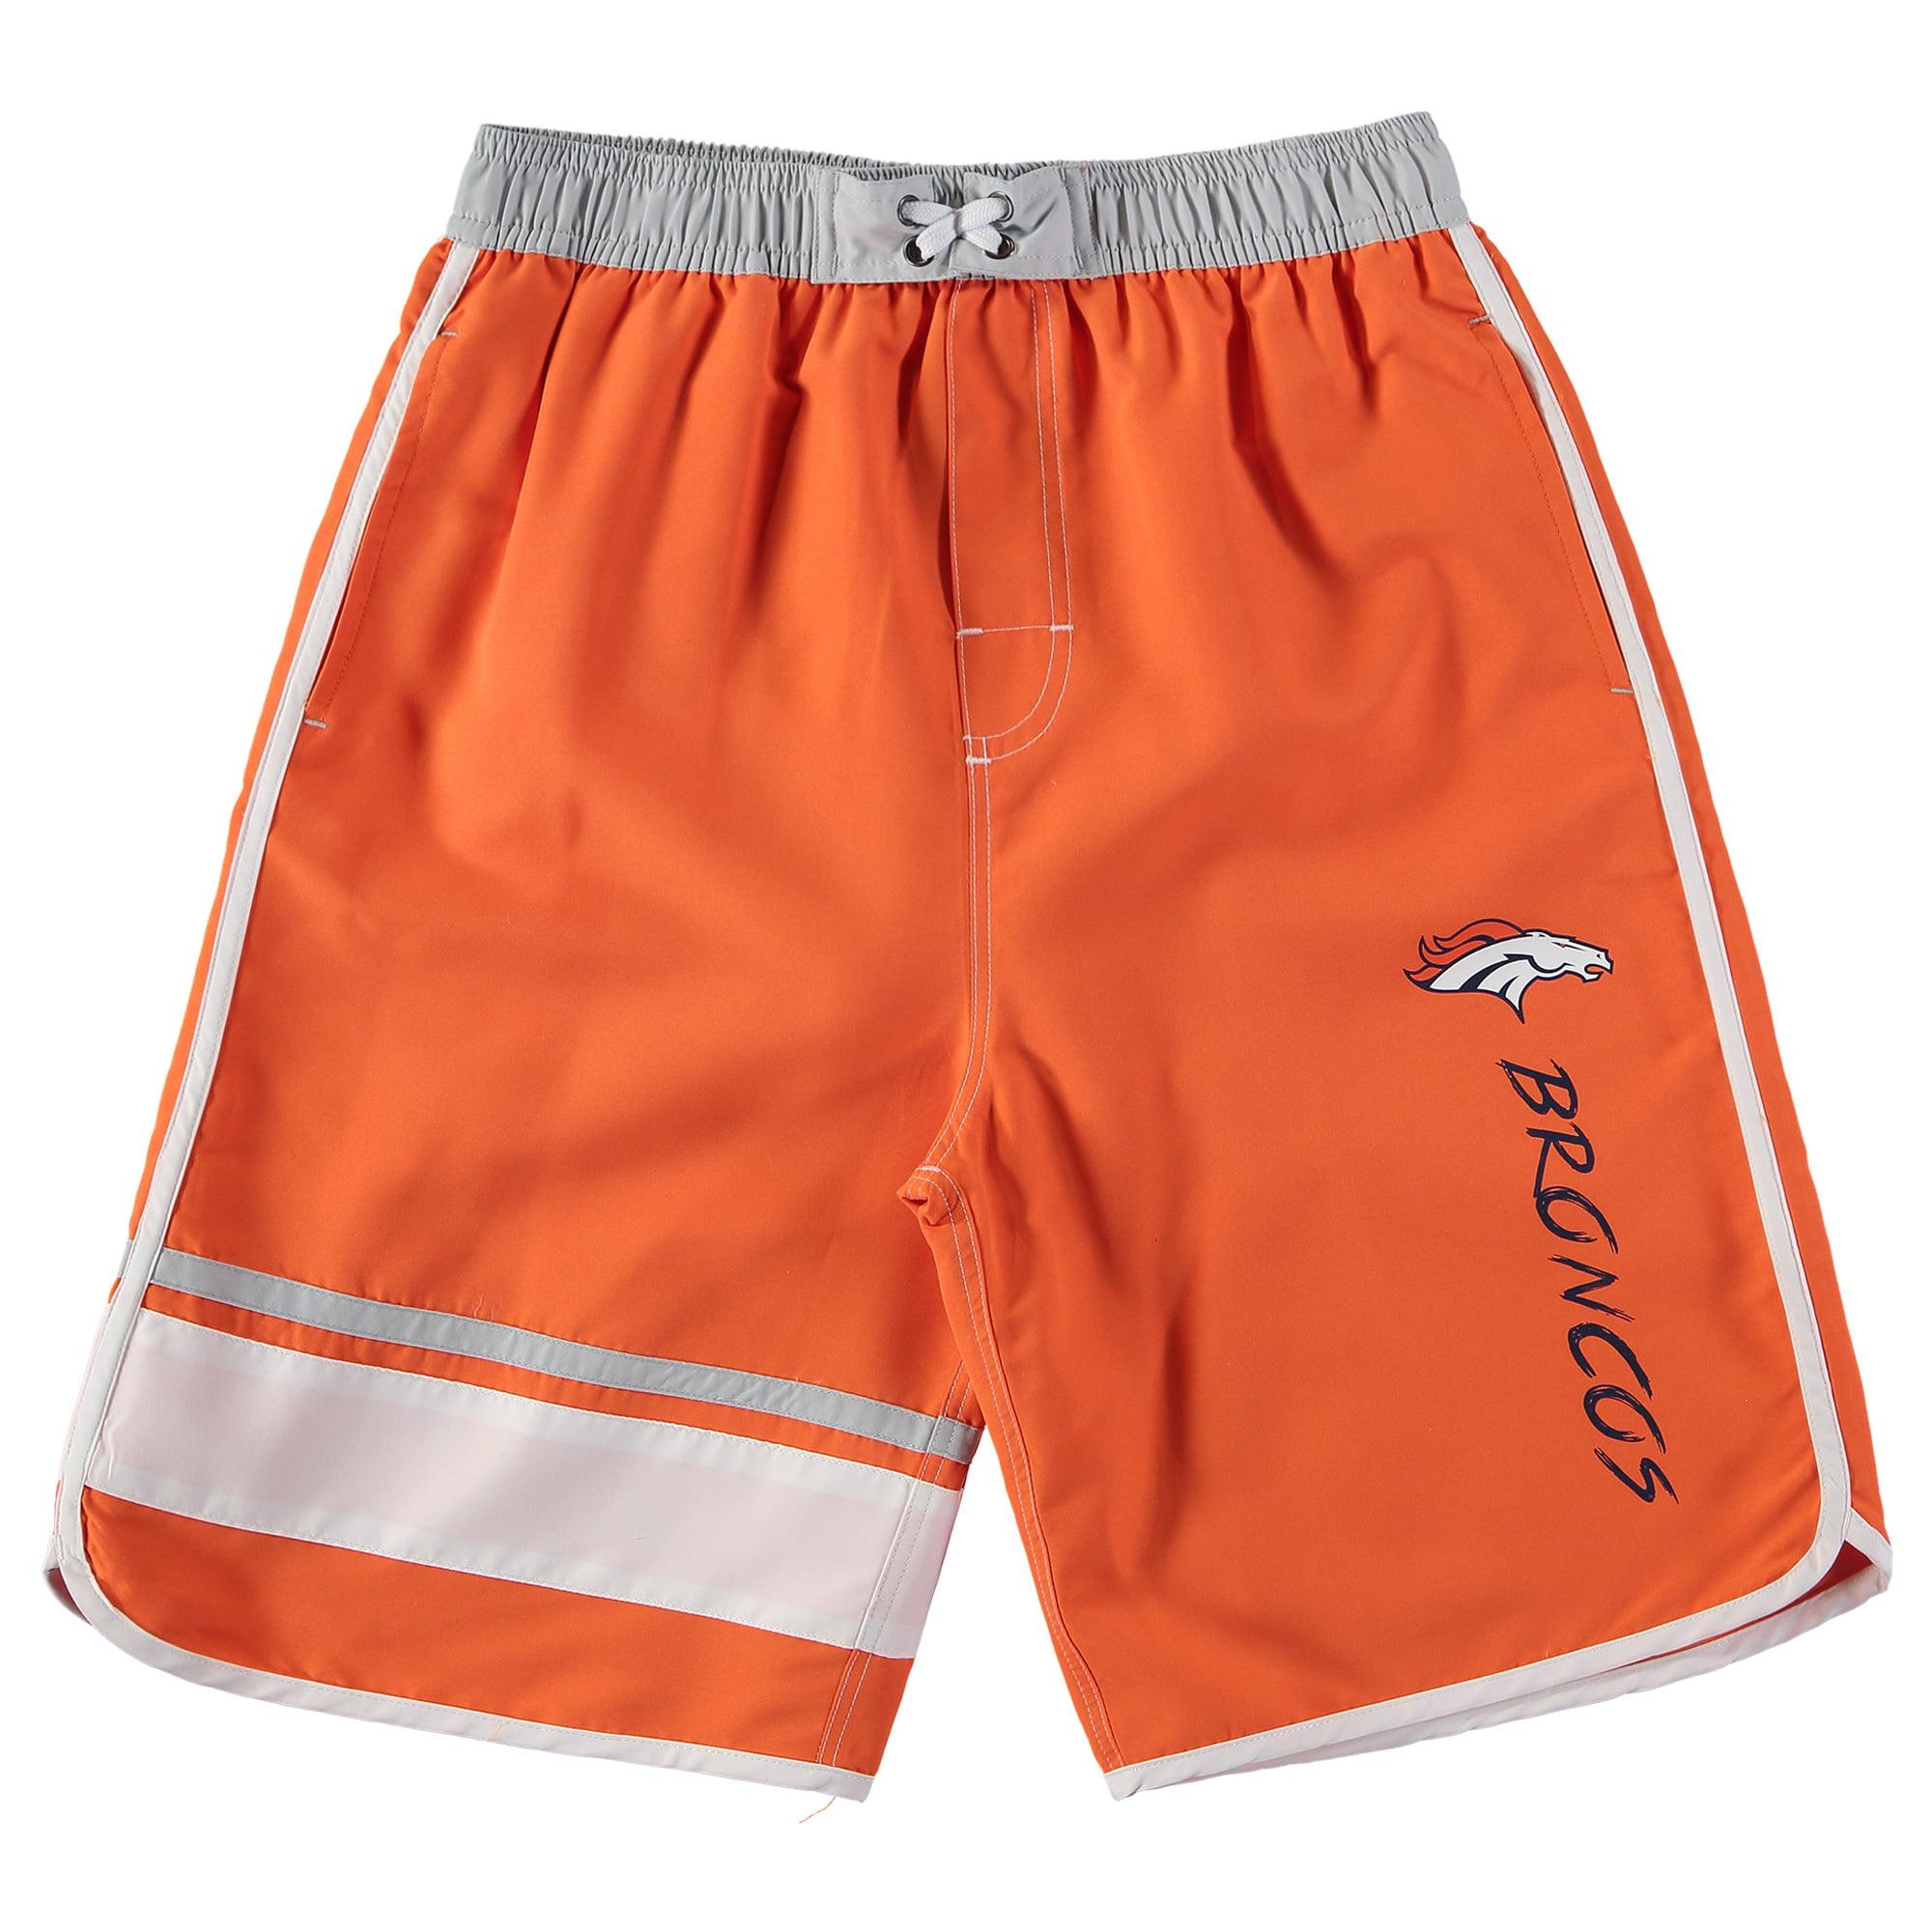 Denver Broncos Youth Color Blocked Swim Trunks - Orange/Gray - Yth XL